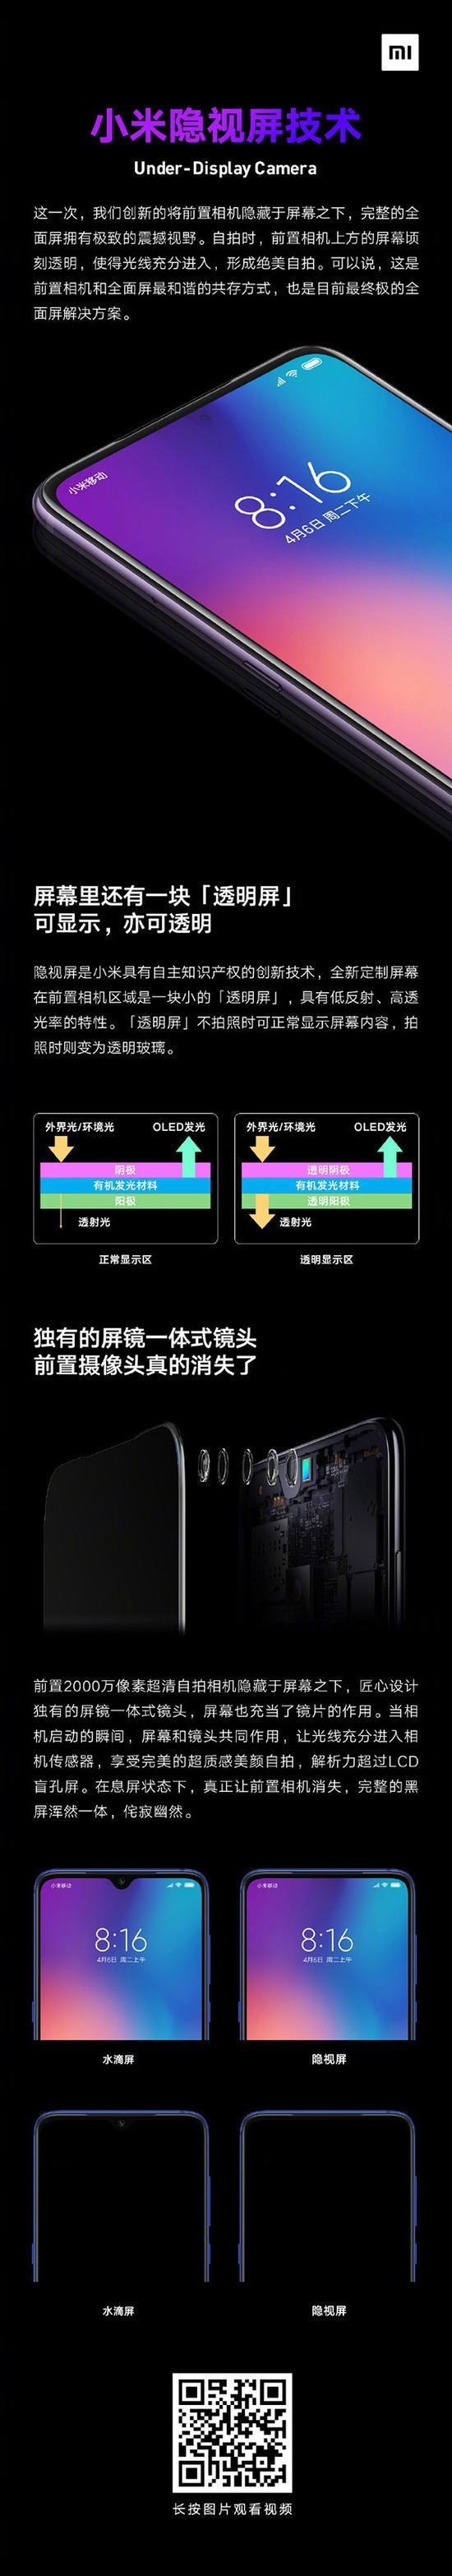 10bet中文手机网·国际区块链基金Dragonfly宣布投资国产公链项目Nervos